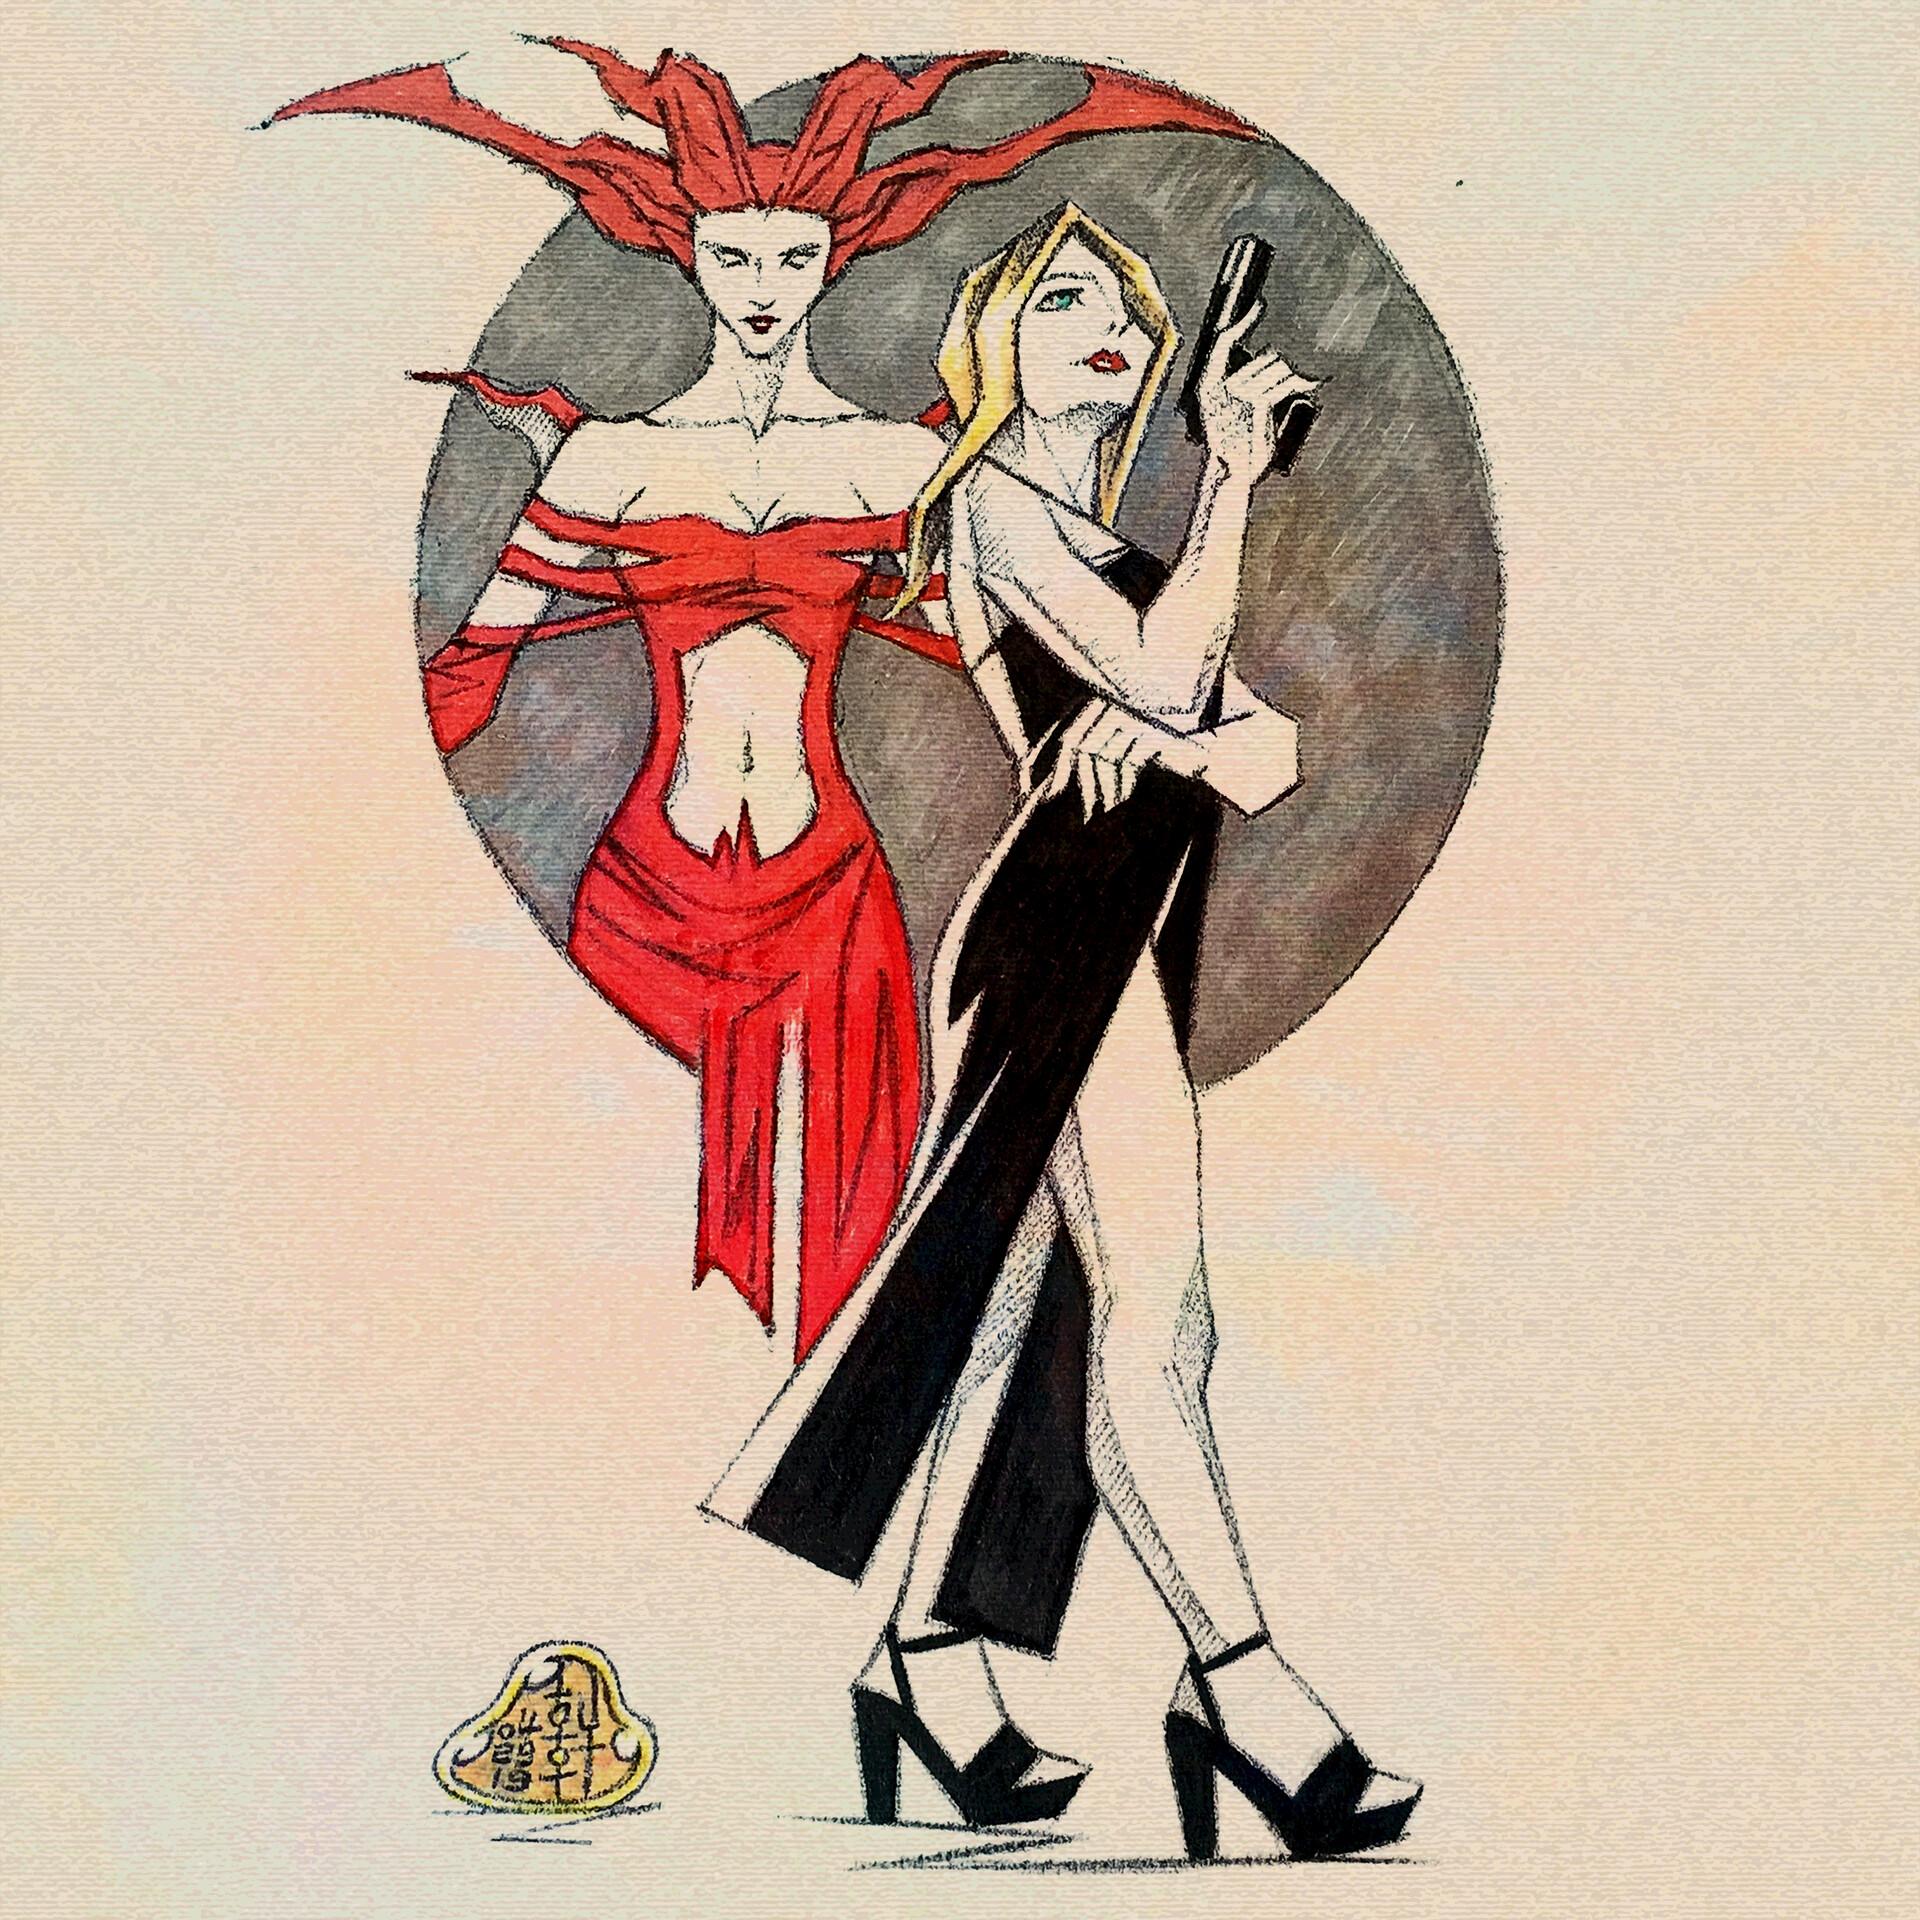 Aya and Eve - Sketch Version II